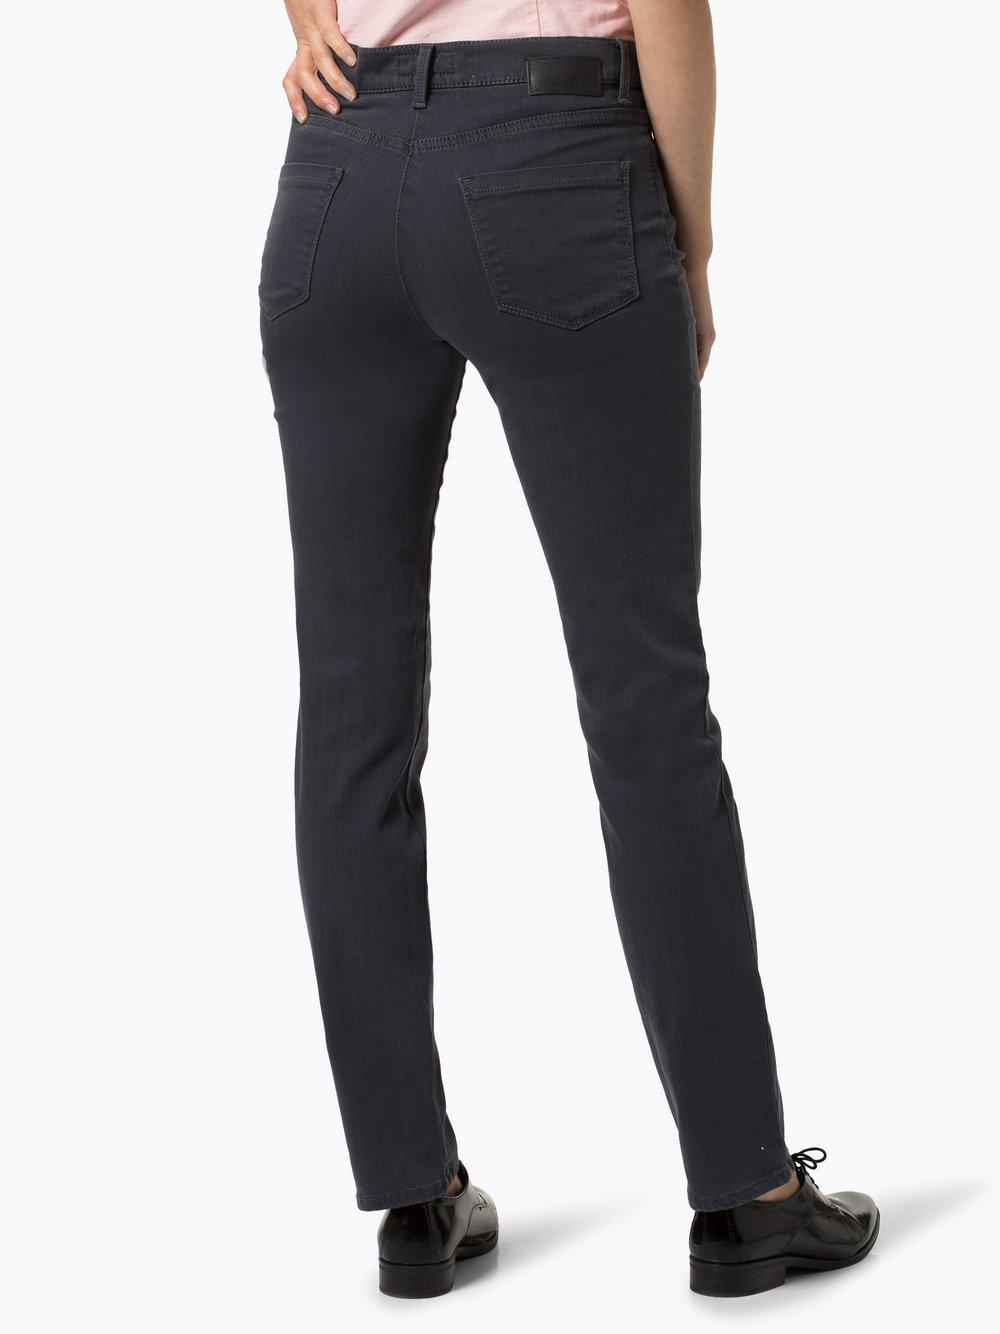 BRAX Damen Stretch-Jeans Sarablue Slim Fit NEU Größe M//38